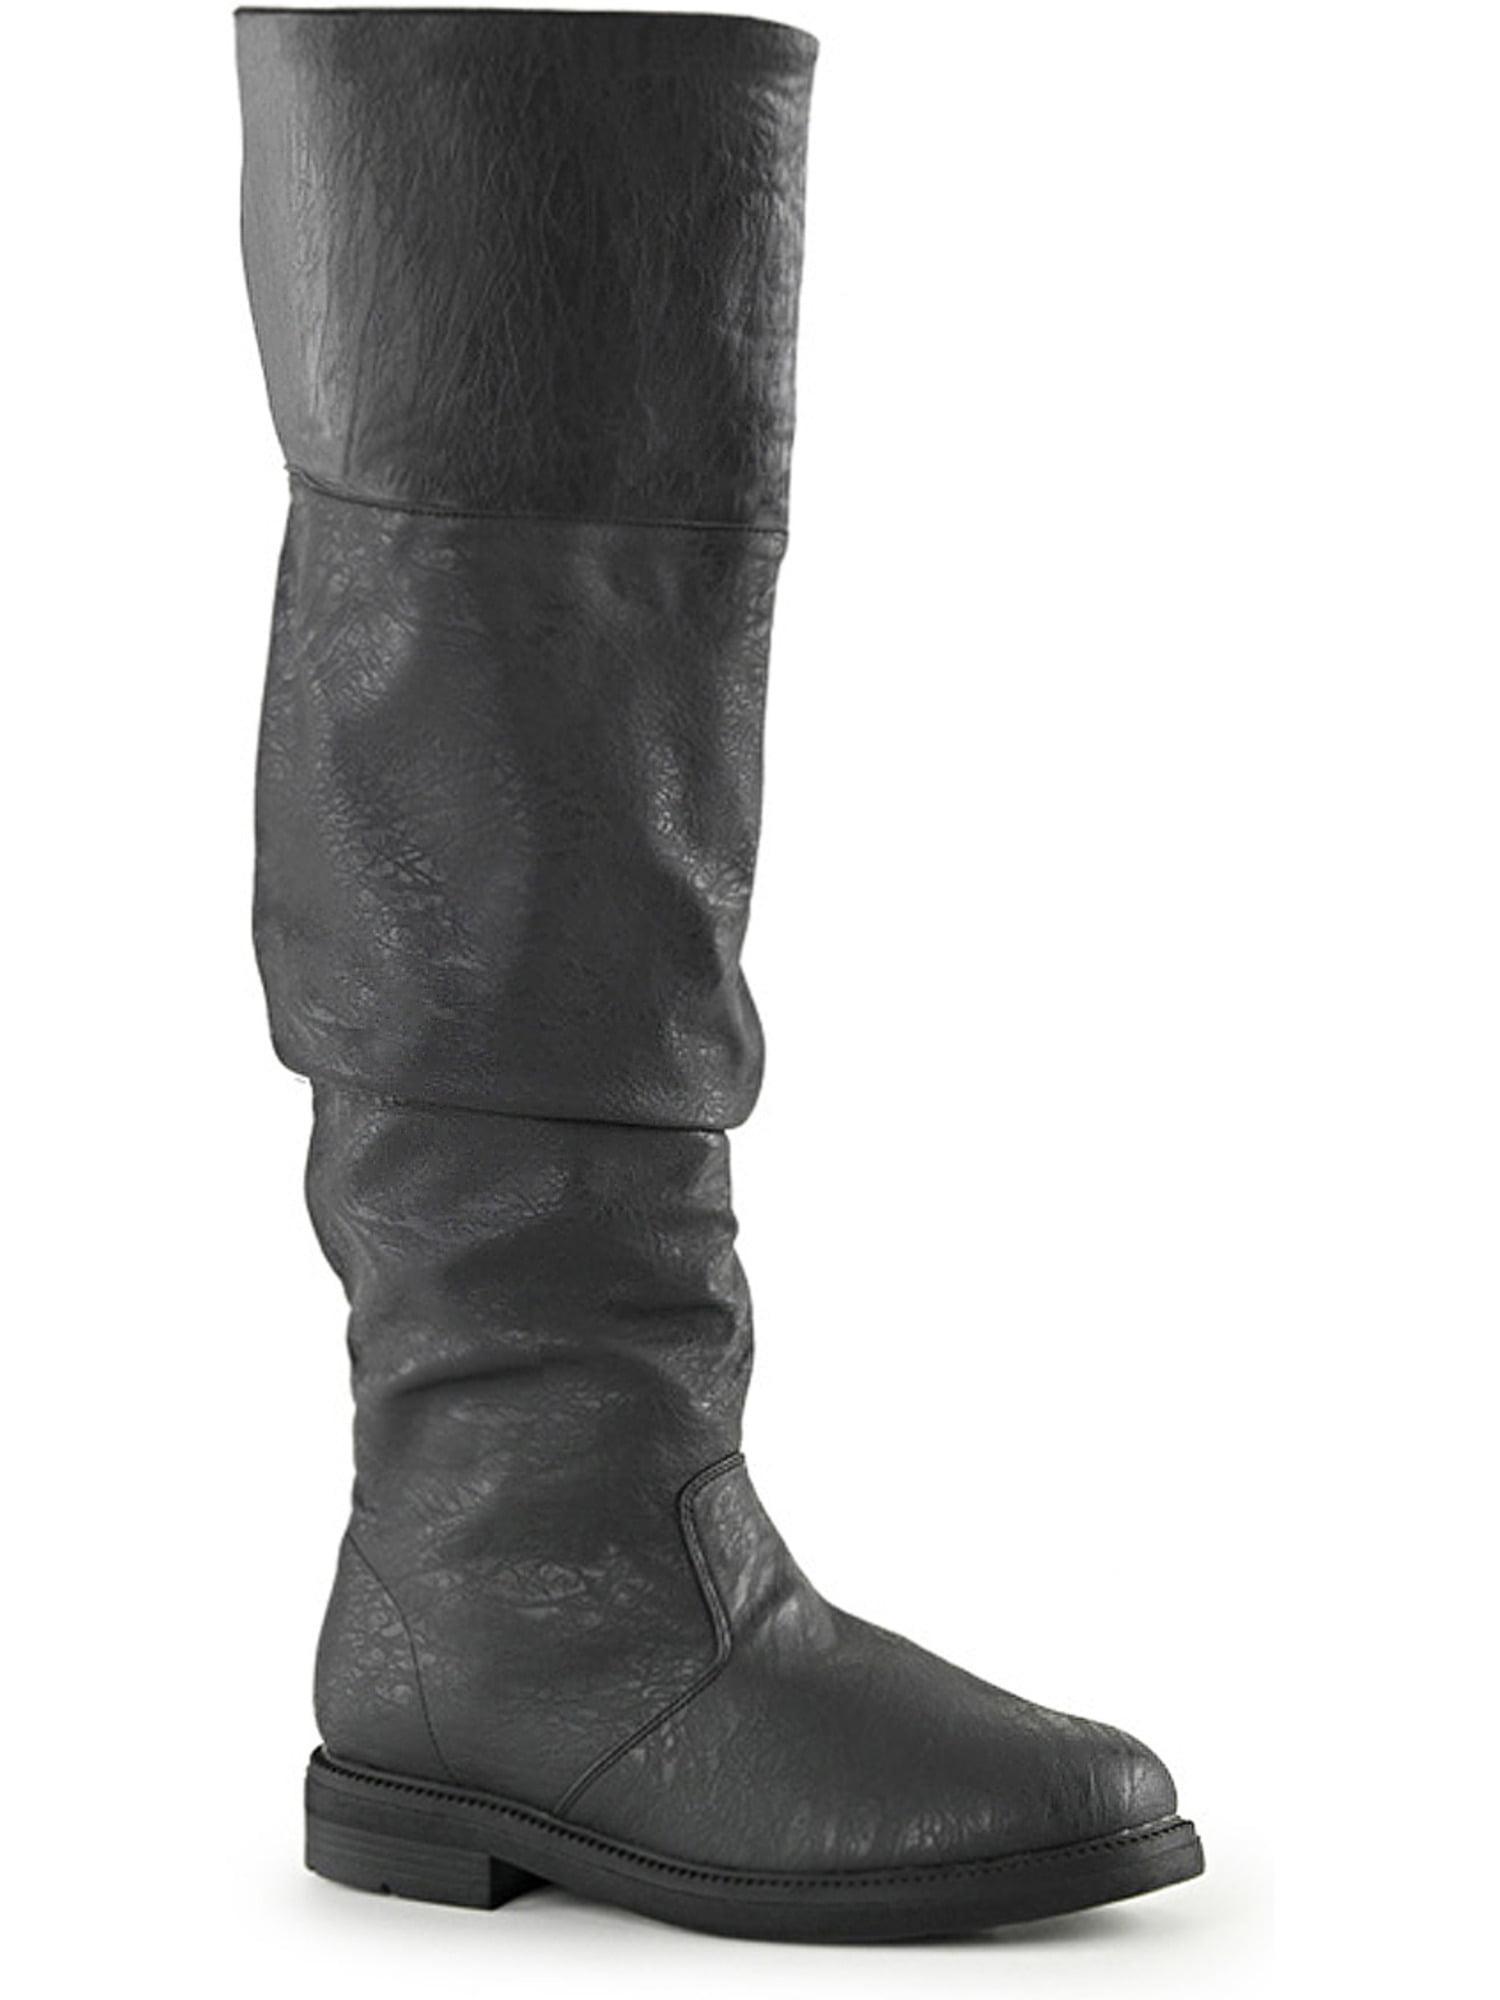 Mens Flat Heel Boots Black Renaissance Costume Boots 1 Inch Heel MENS SIZING